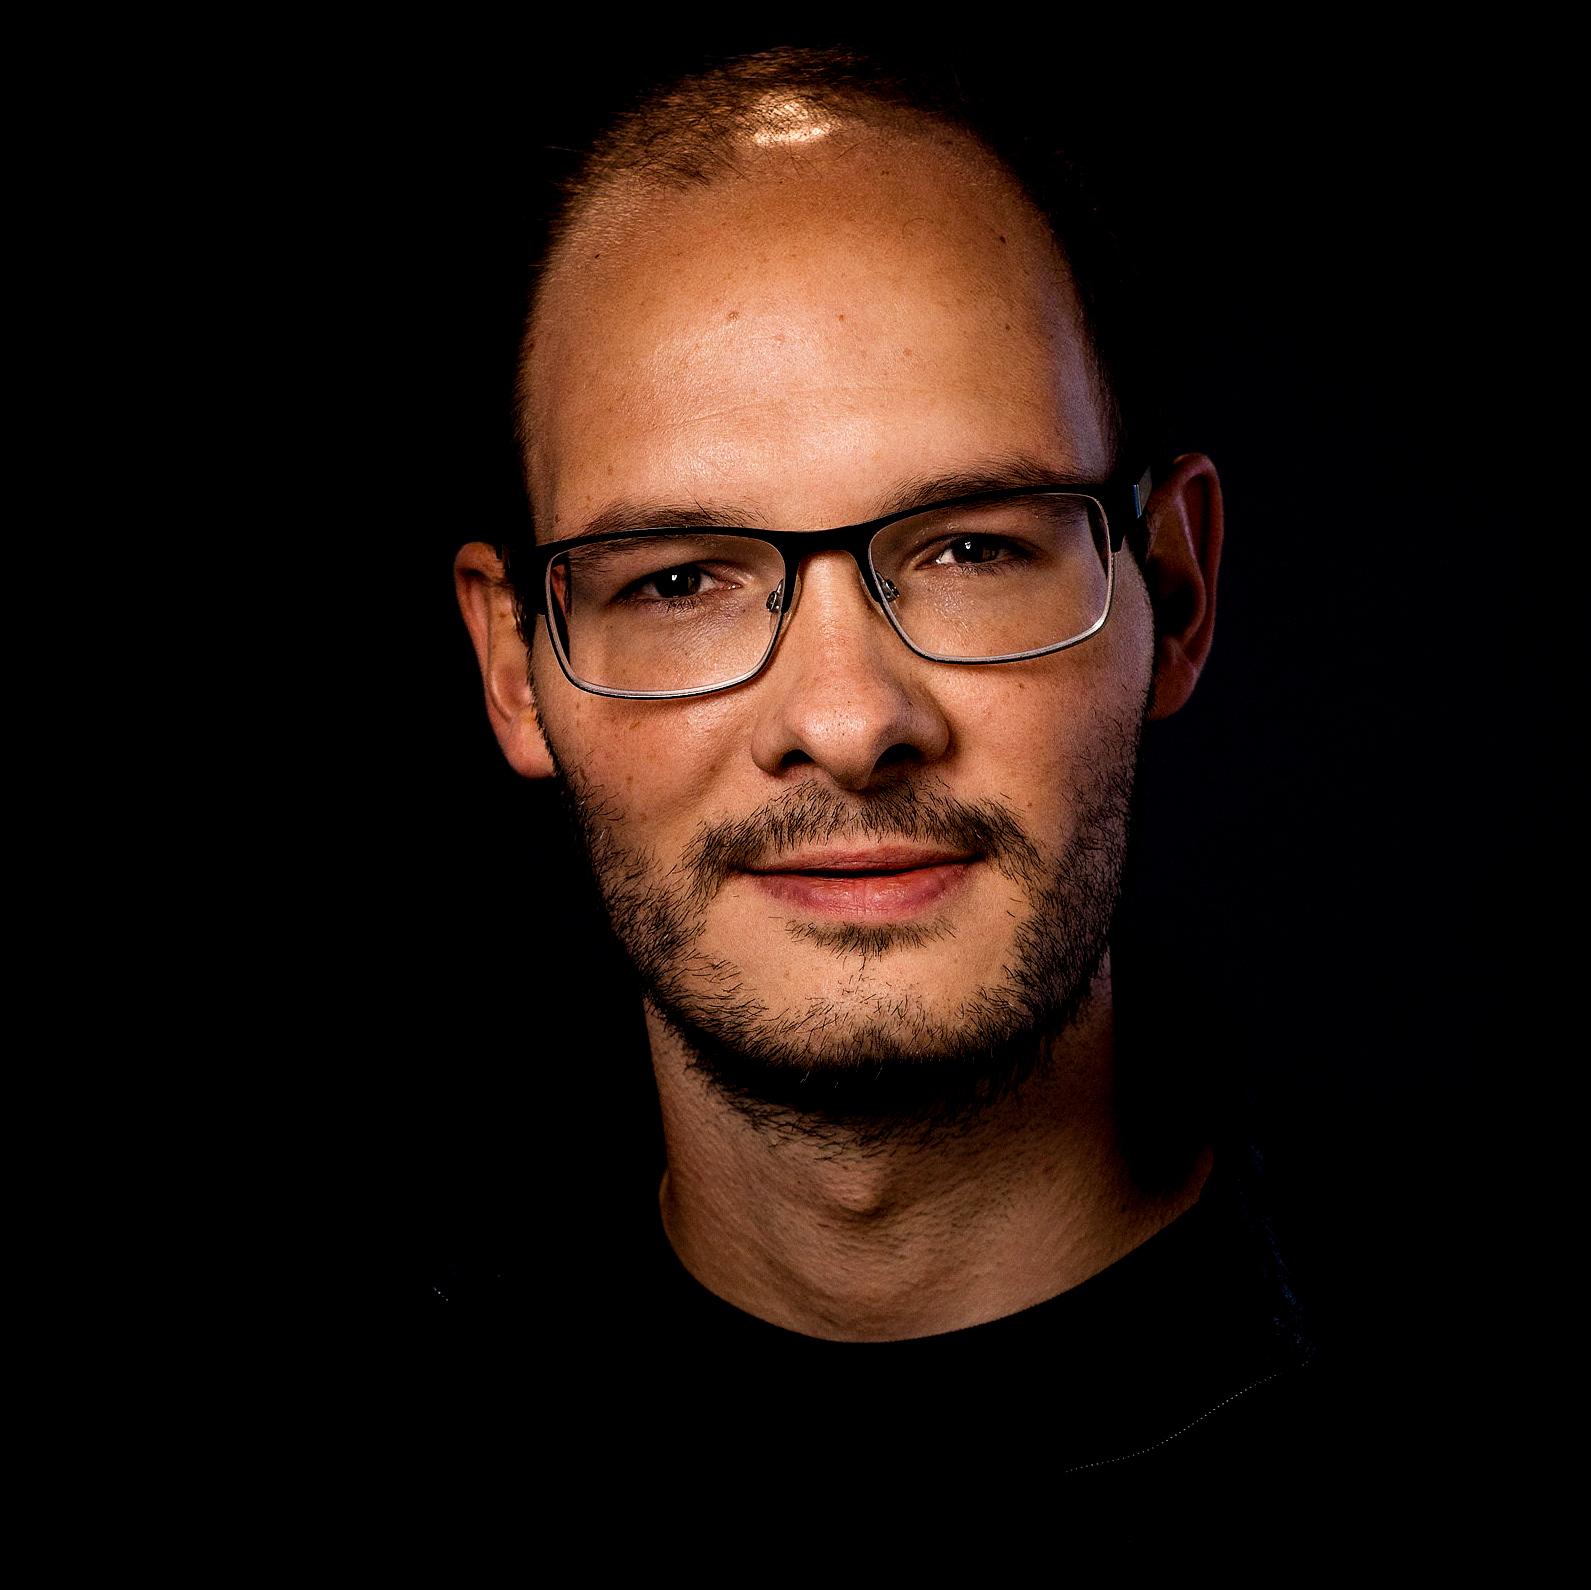 Florian Christoph